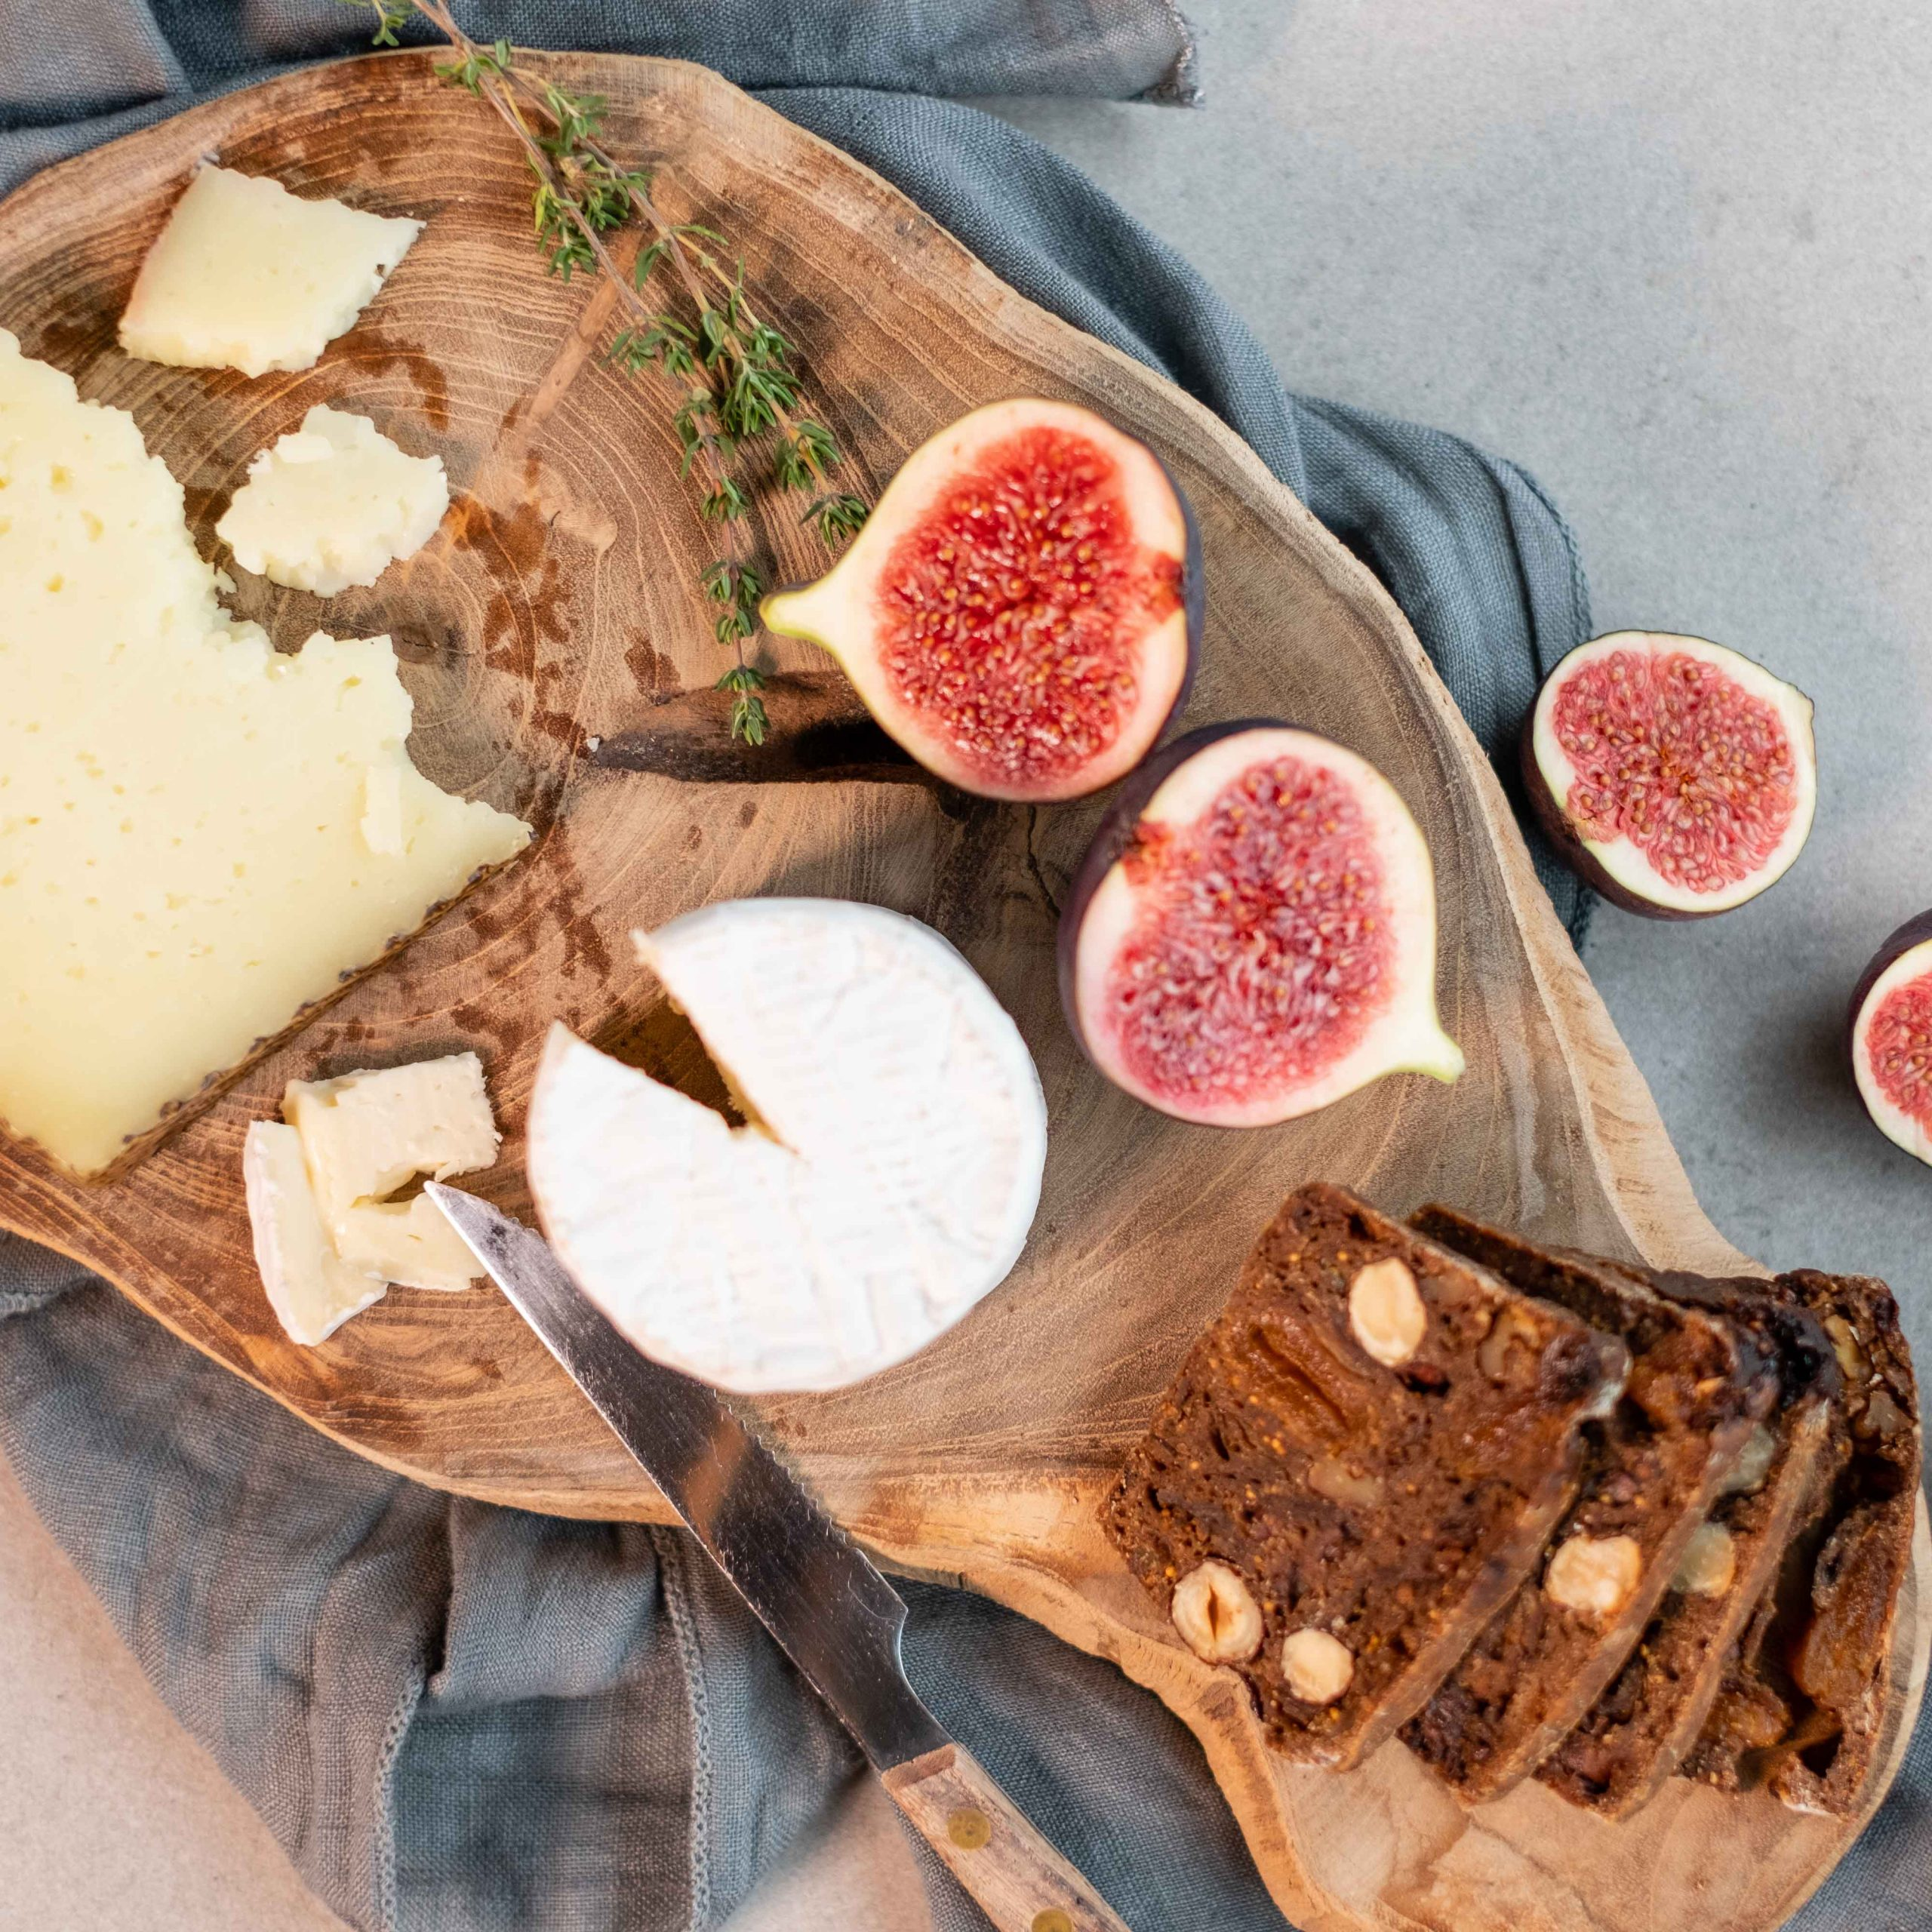 Food fotograaf in Haaksbergen